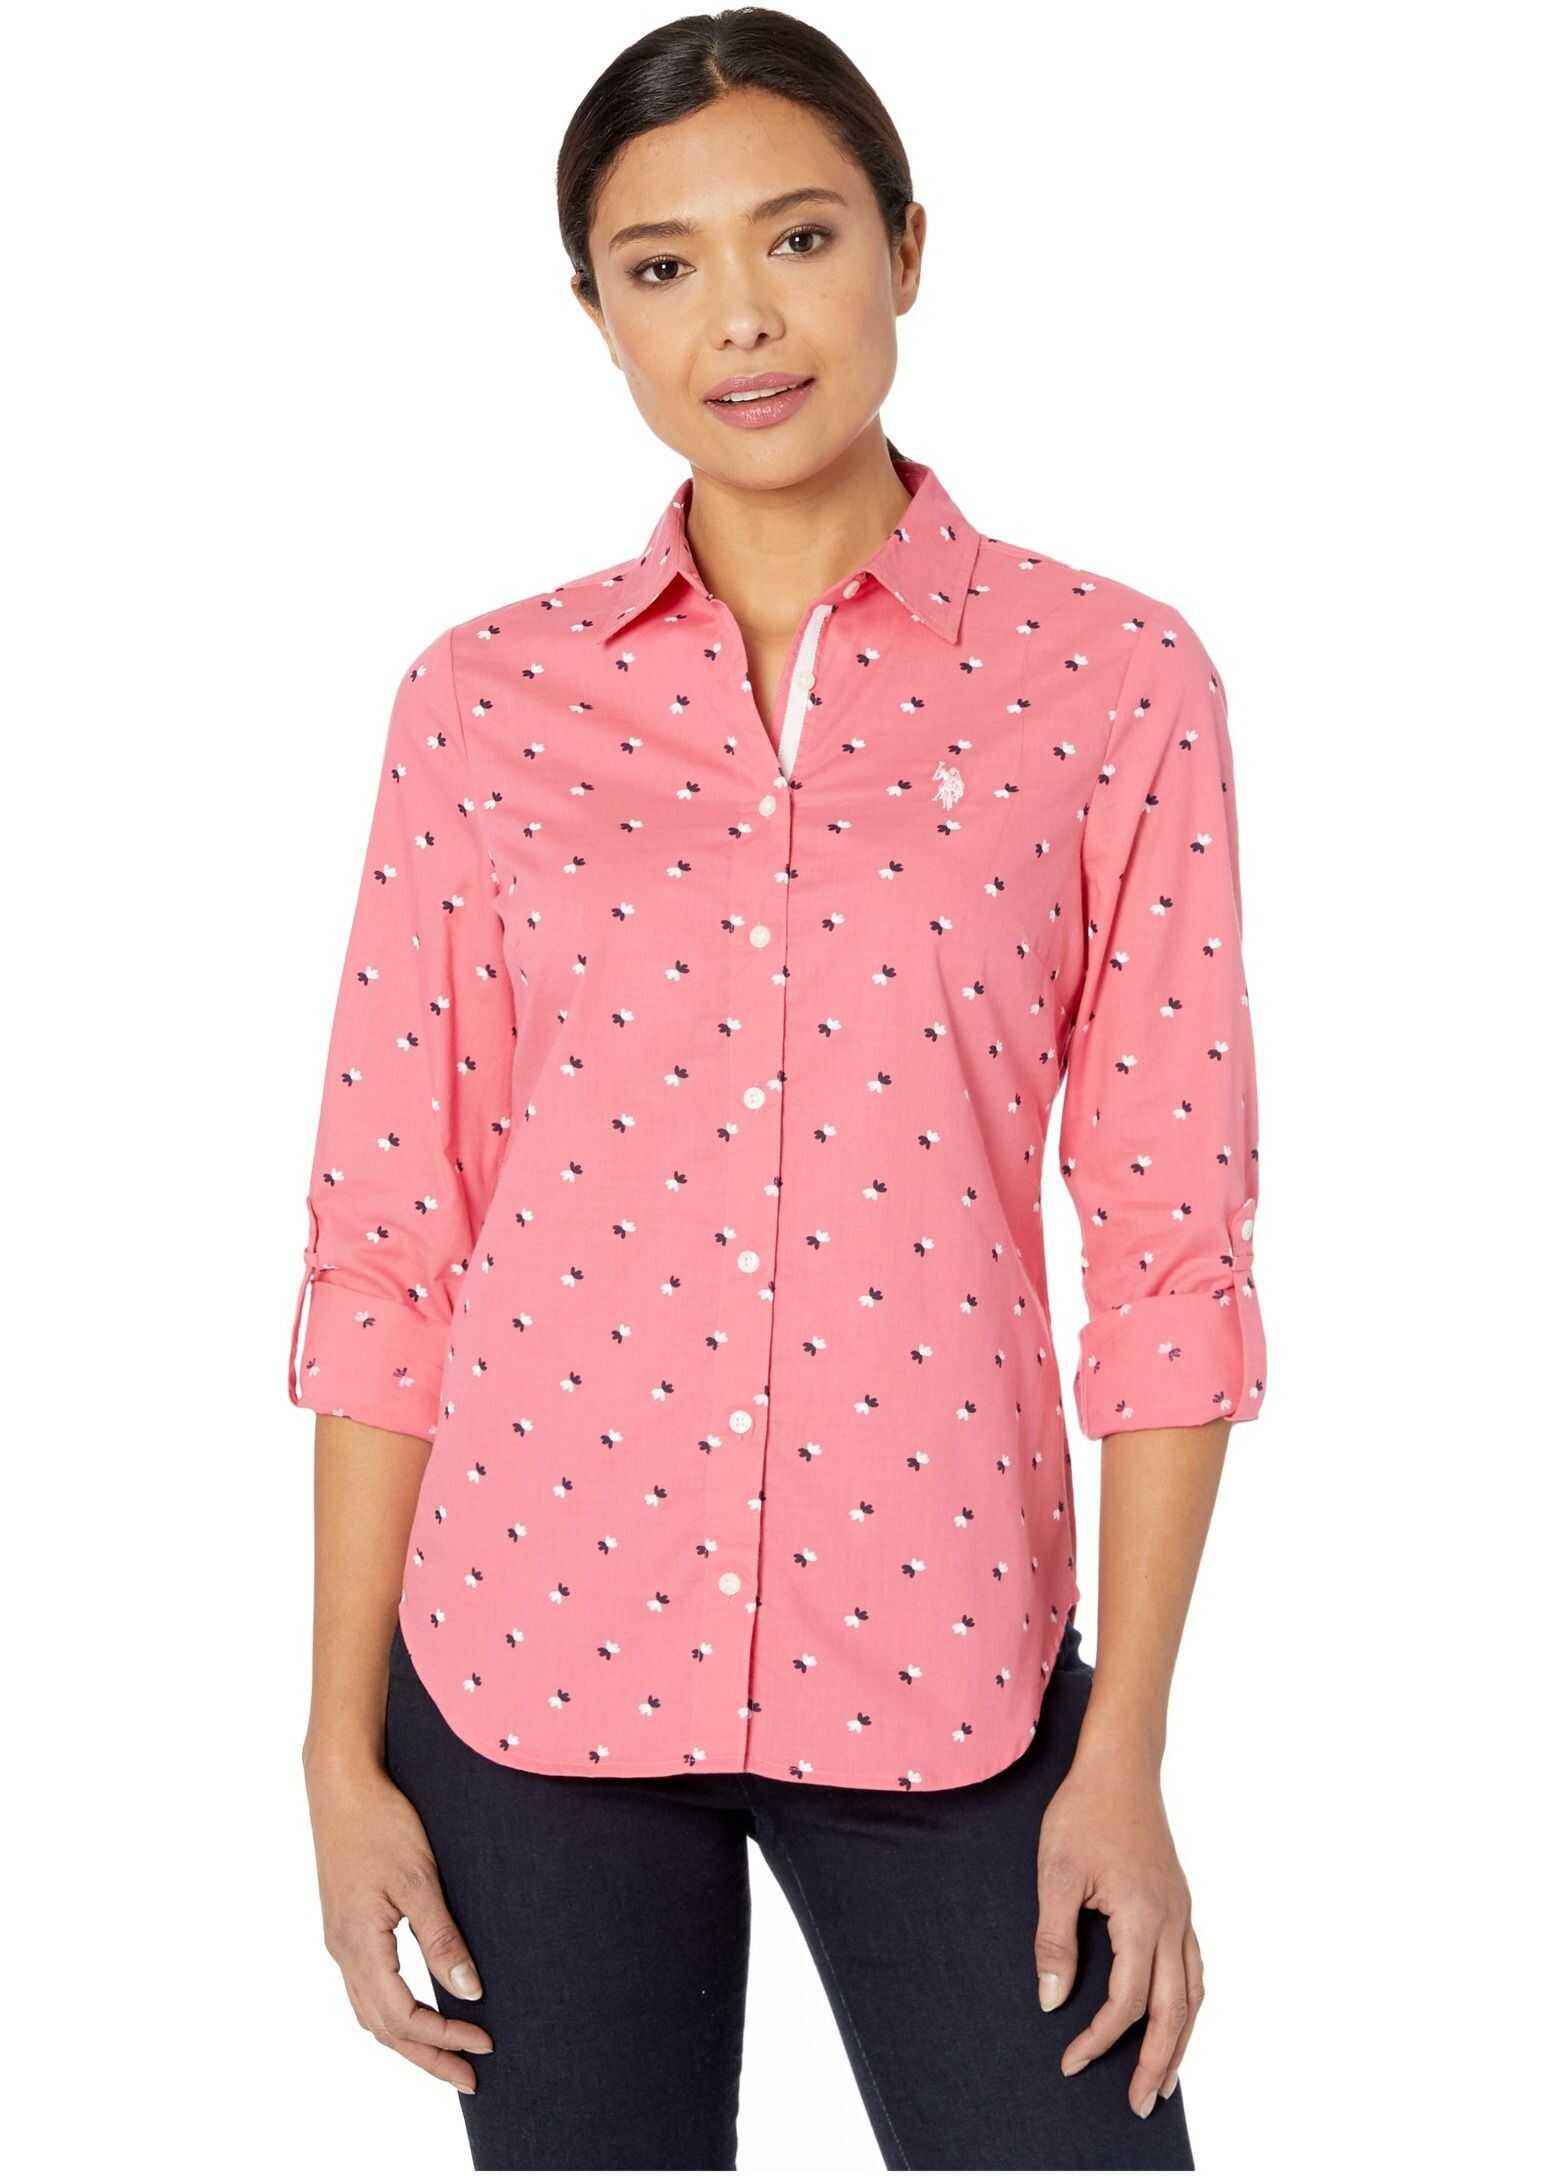 U.S. POLO ASSN. Slub Floral Woven Shirt Sour Cherry